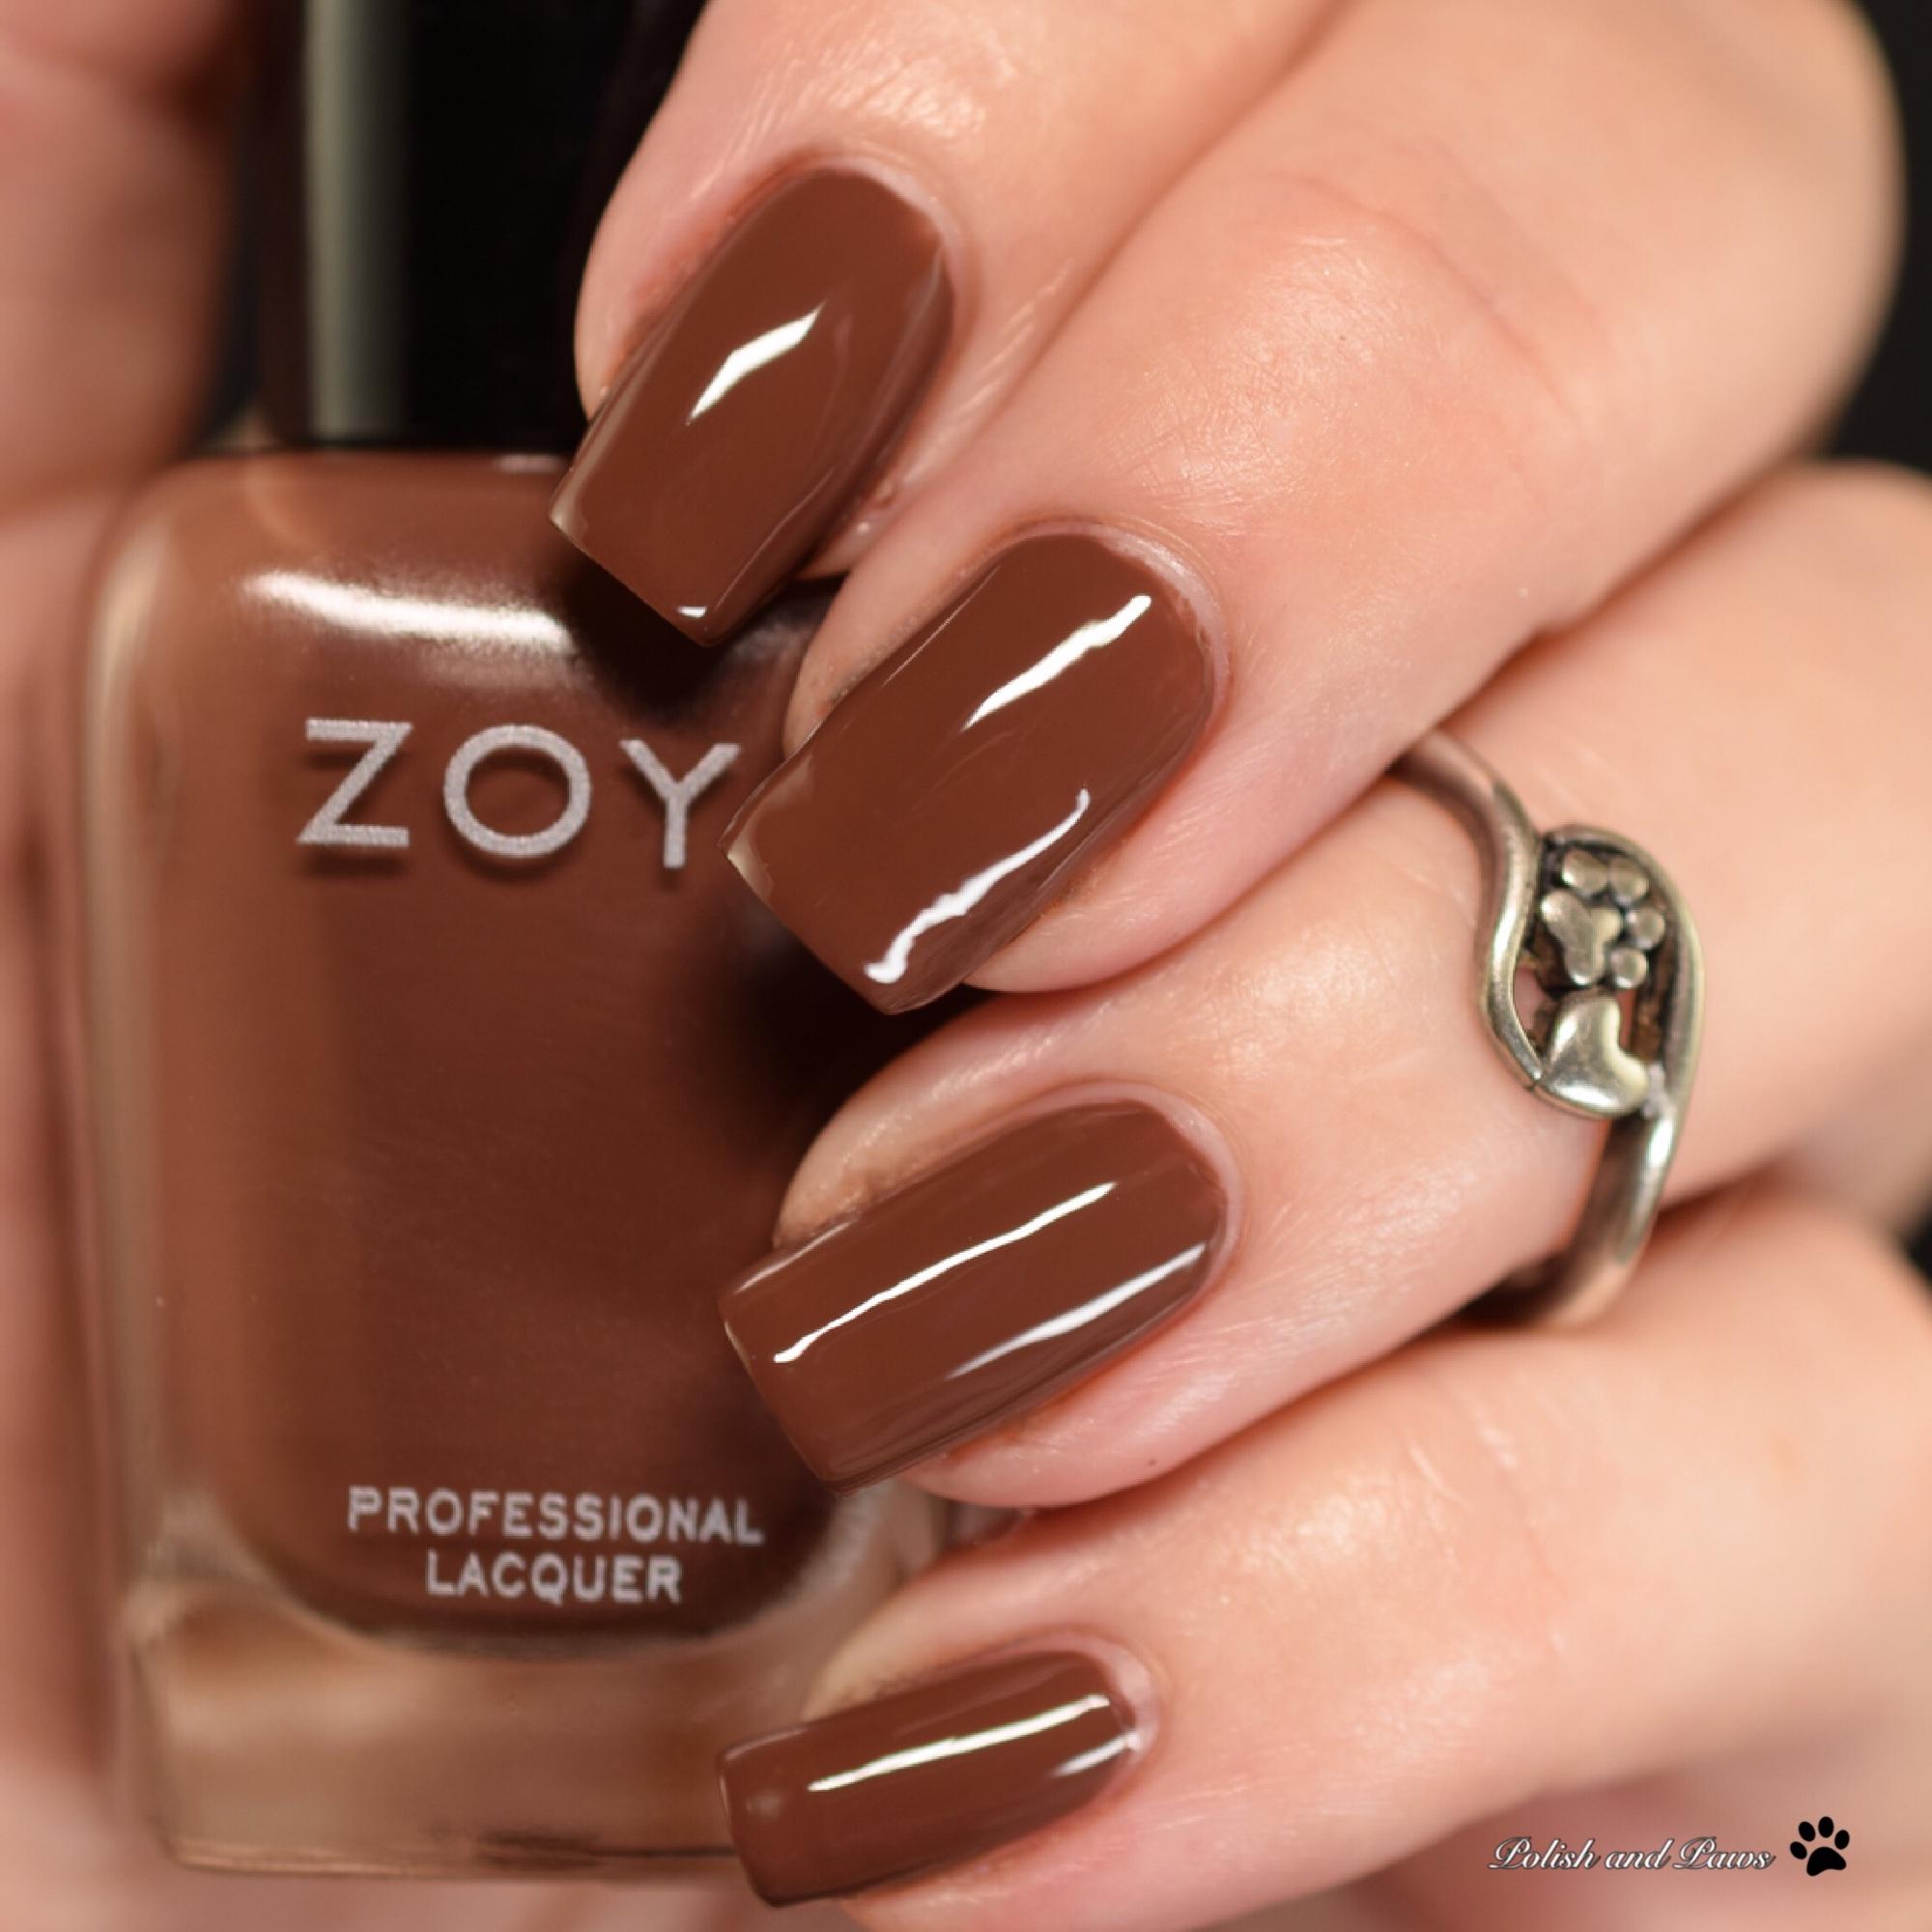 Zoya Foster